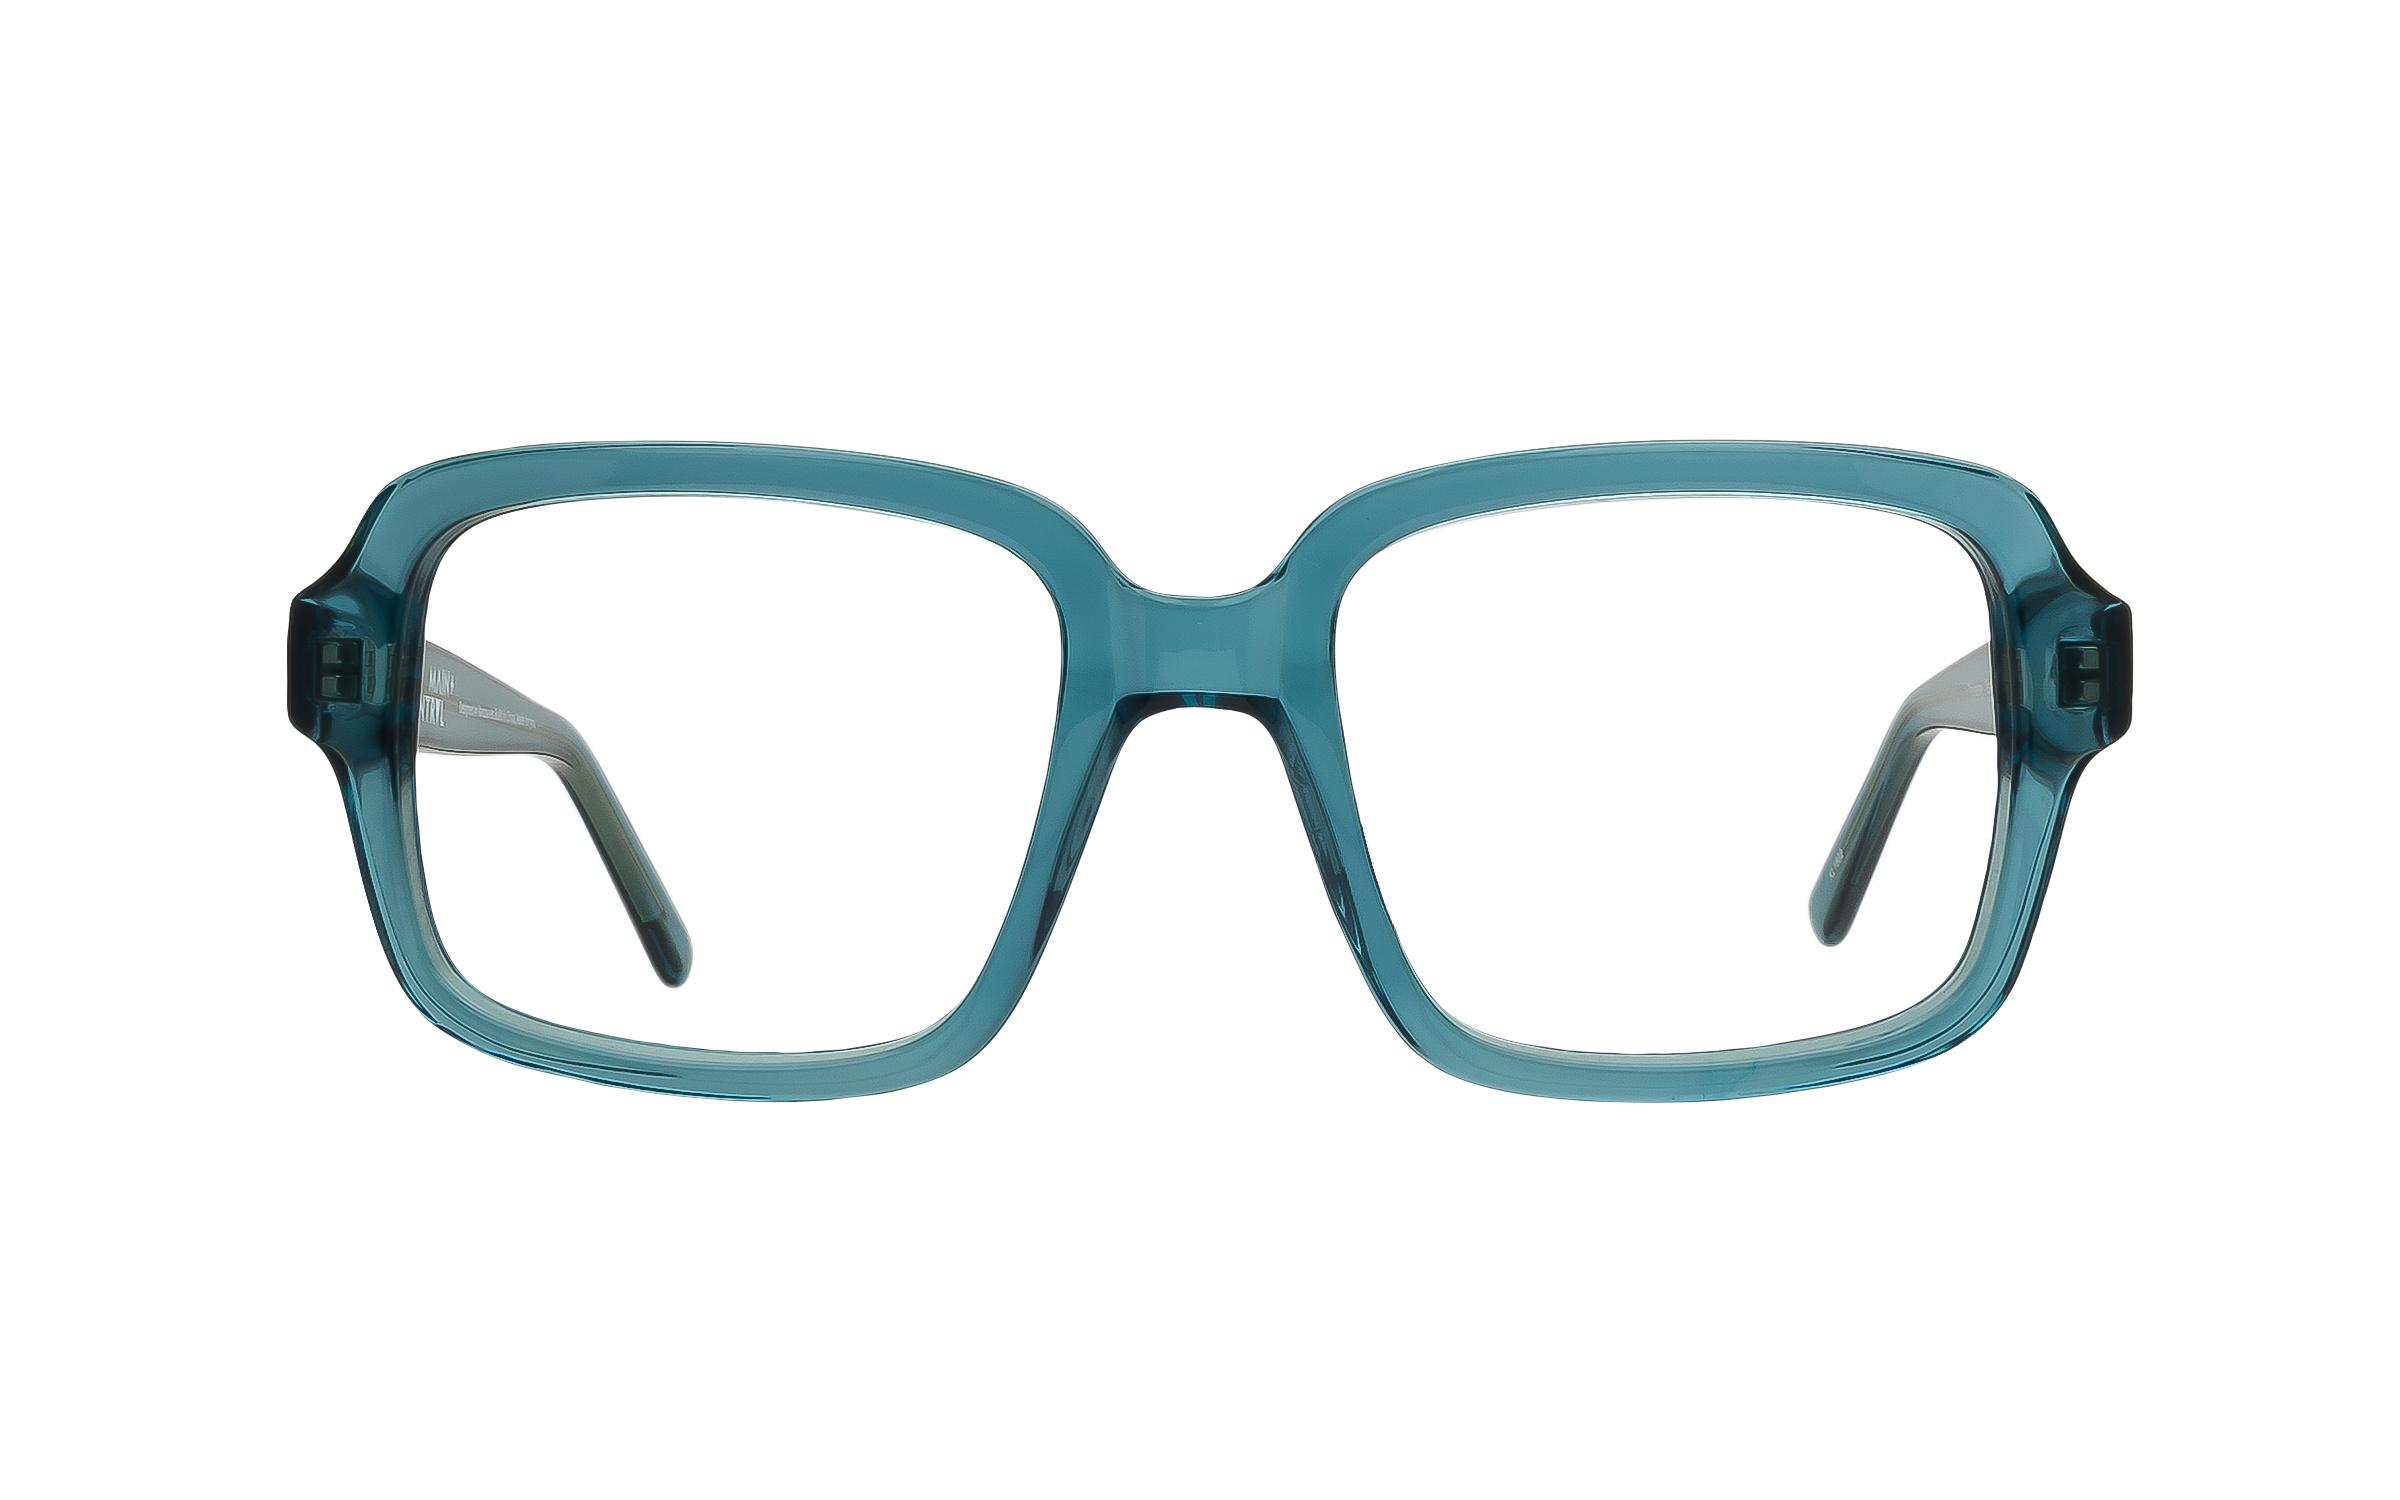 Teal eyeglass frames | Eyeglasses | Compare Prices at Nextag